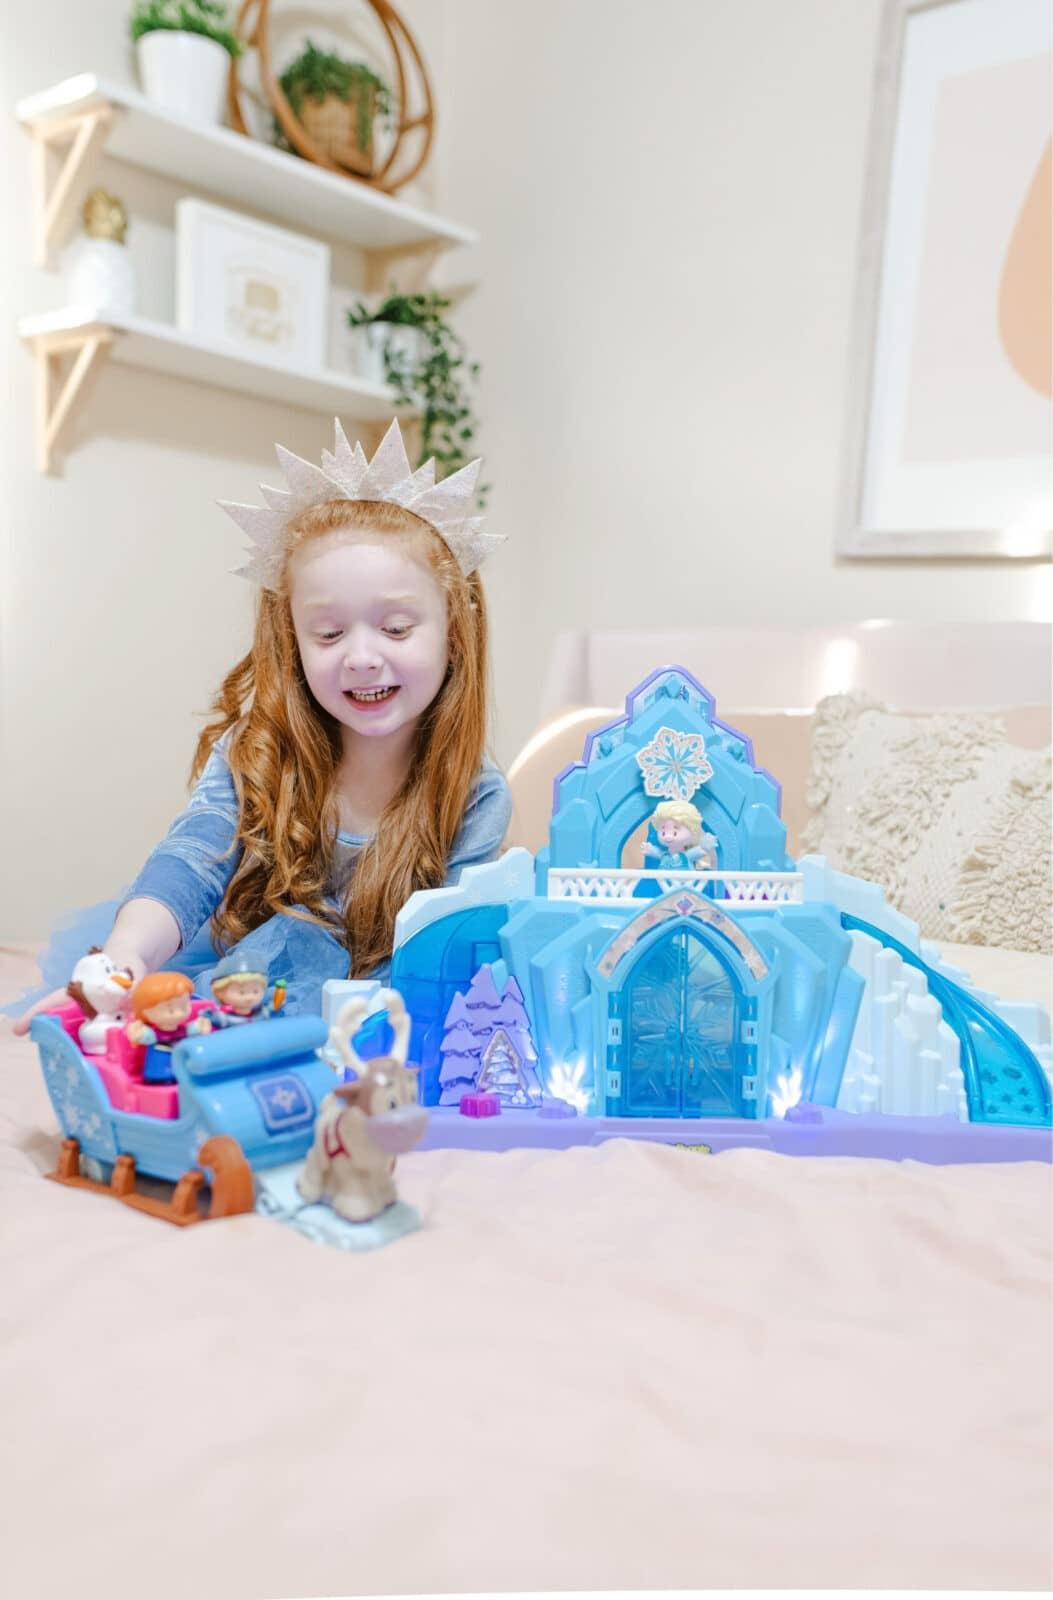 Disney Frozen Favorites: Elsa's Ice Palace And Kristoff's Sleigh